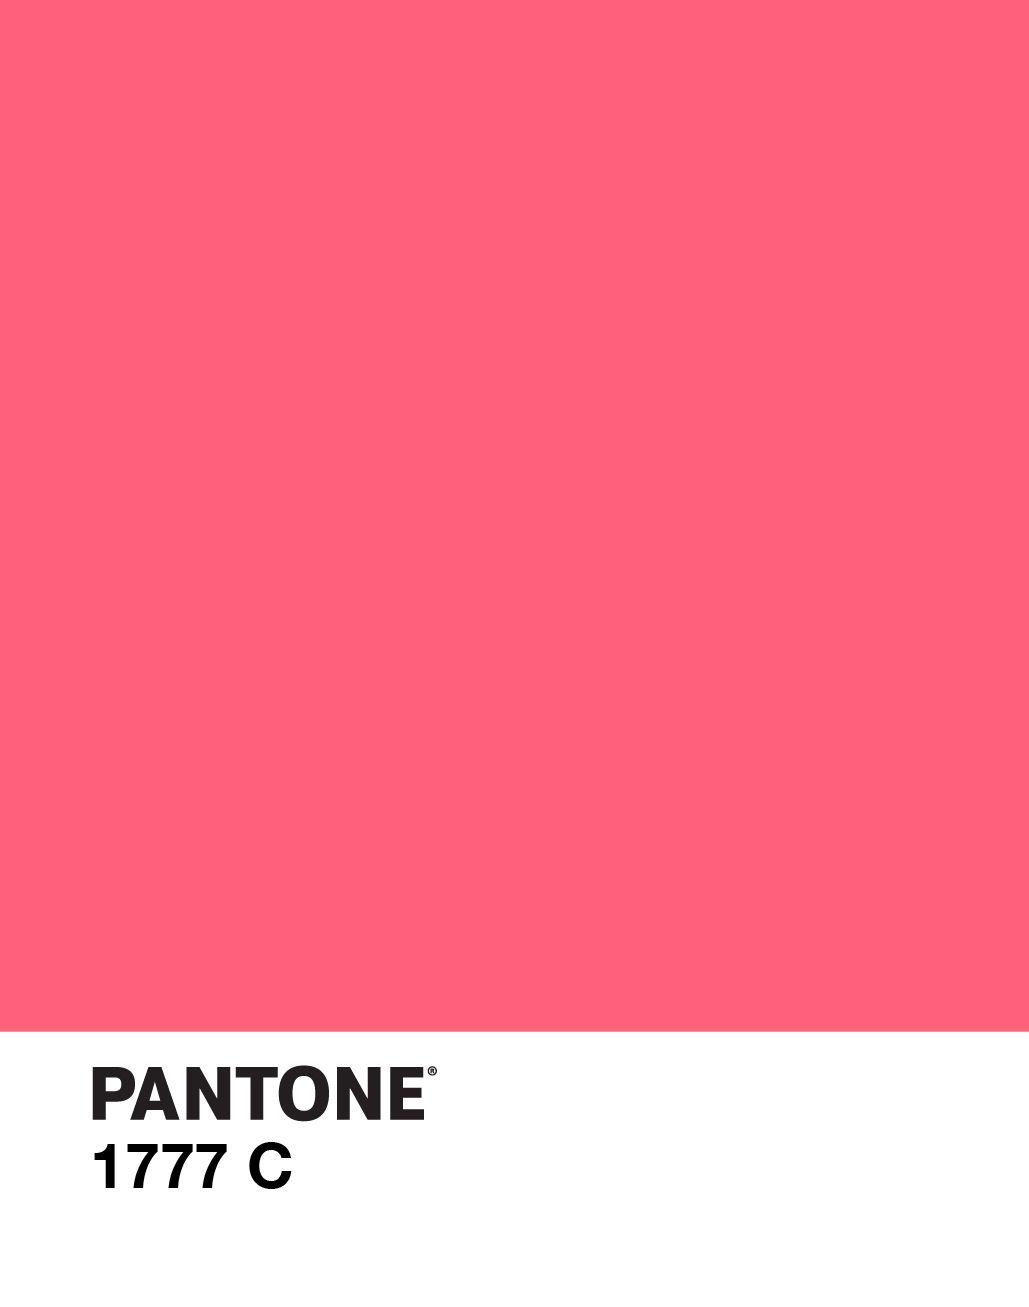 pantone 1777 c design color pink rasberry pantones pinterest pink pantone and dresses. Black Bedroom Furniture Sets. Home Design Ideas